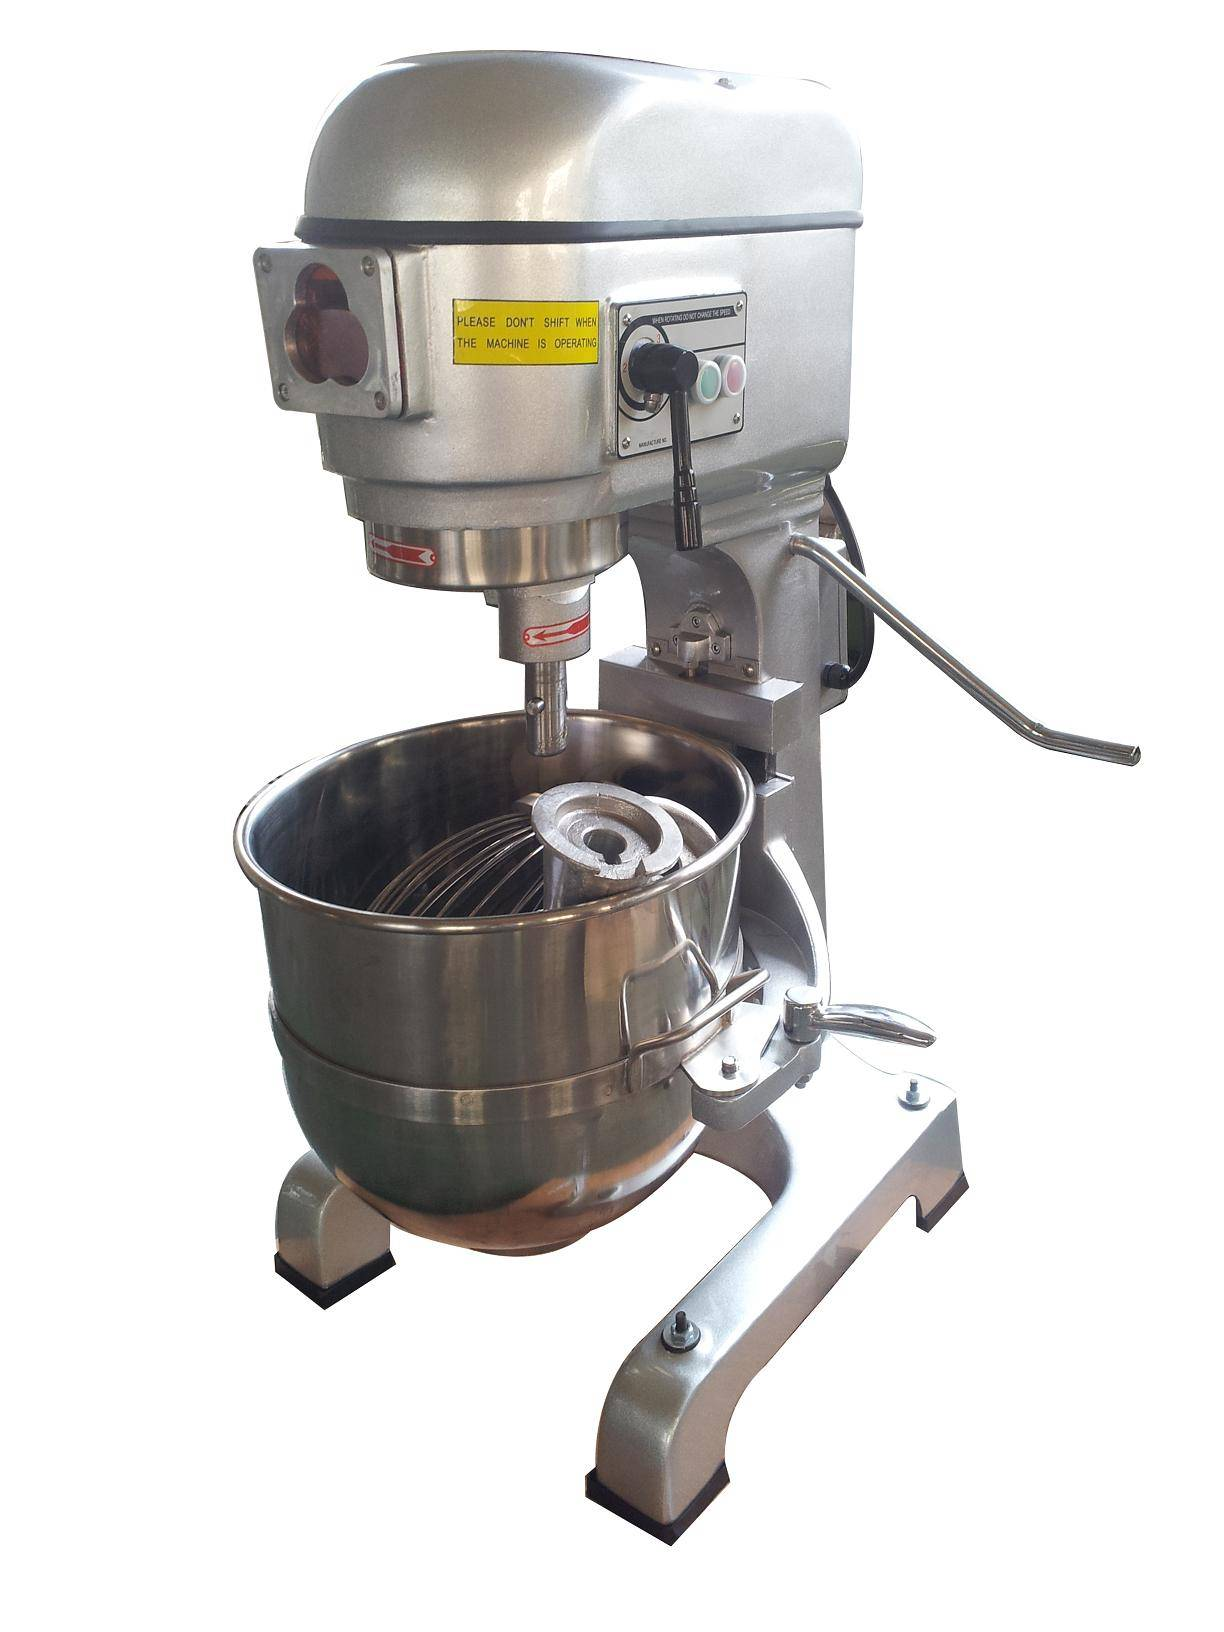 30L planetary mixer